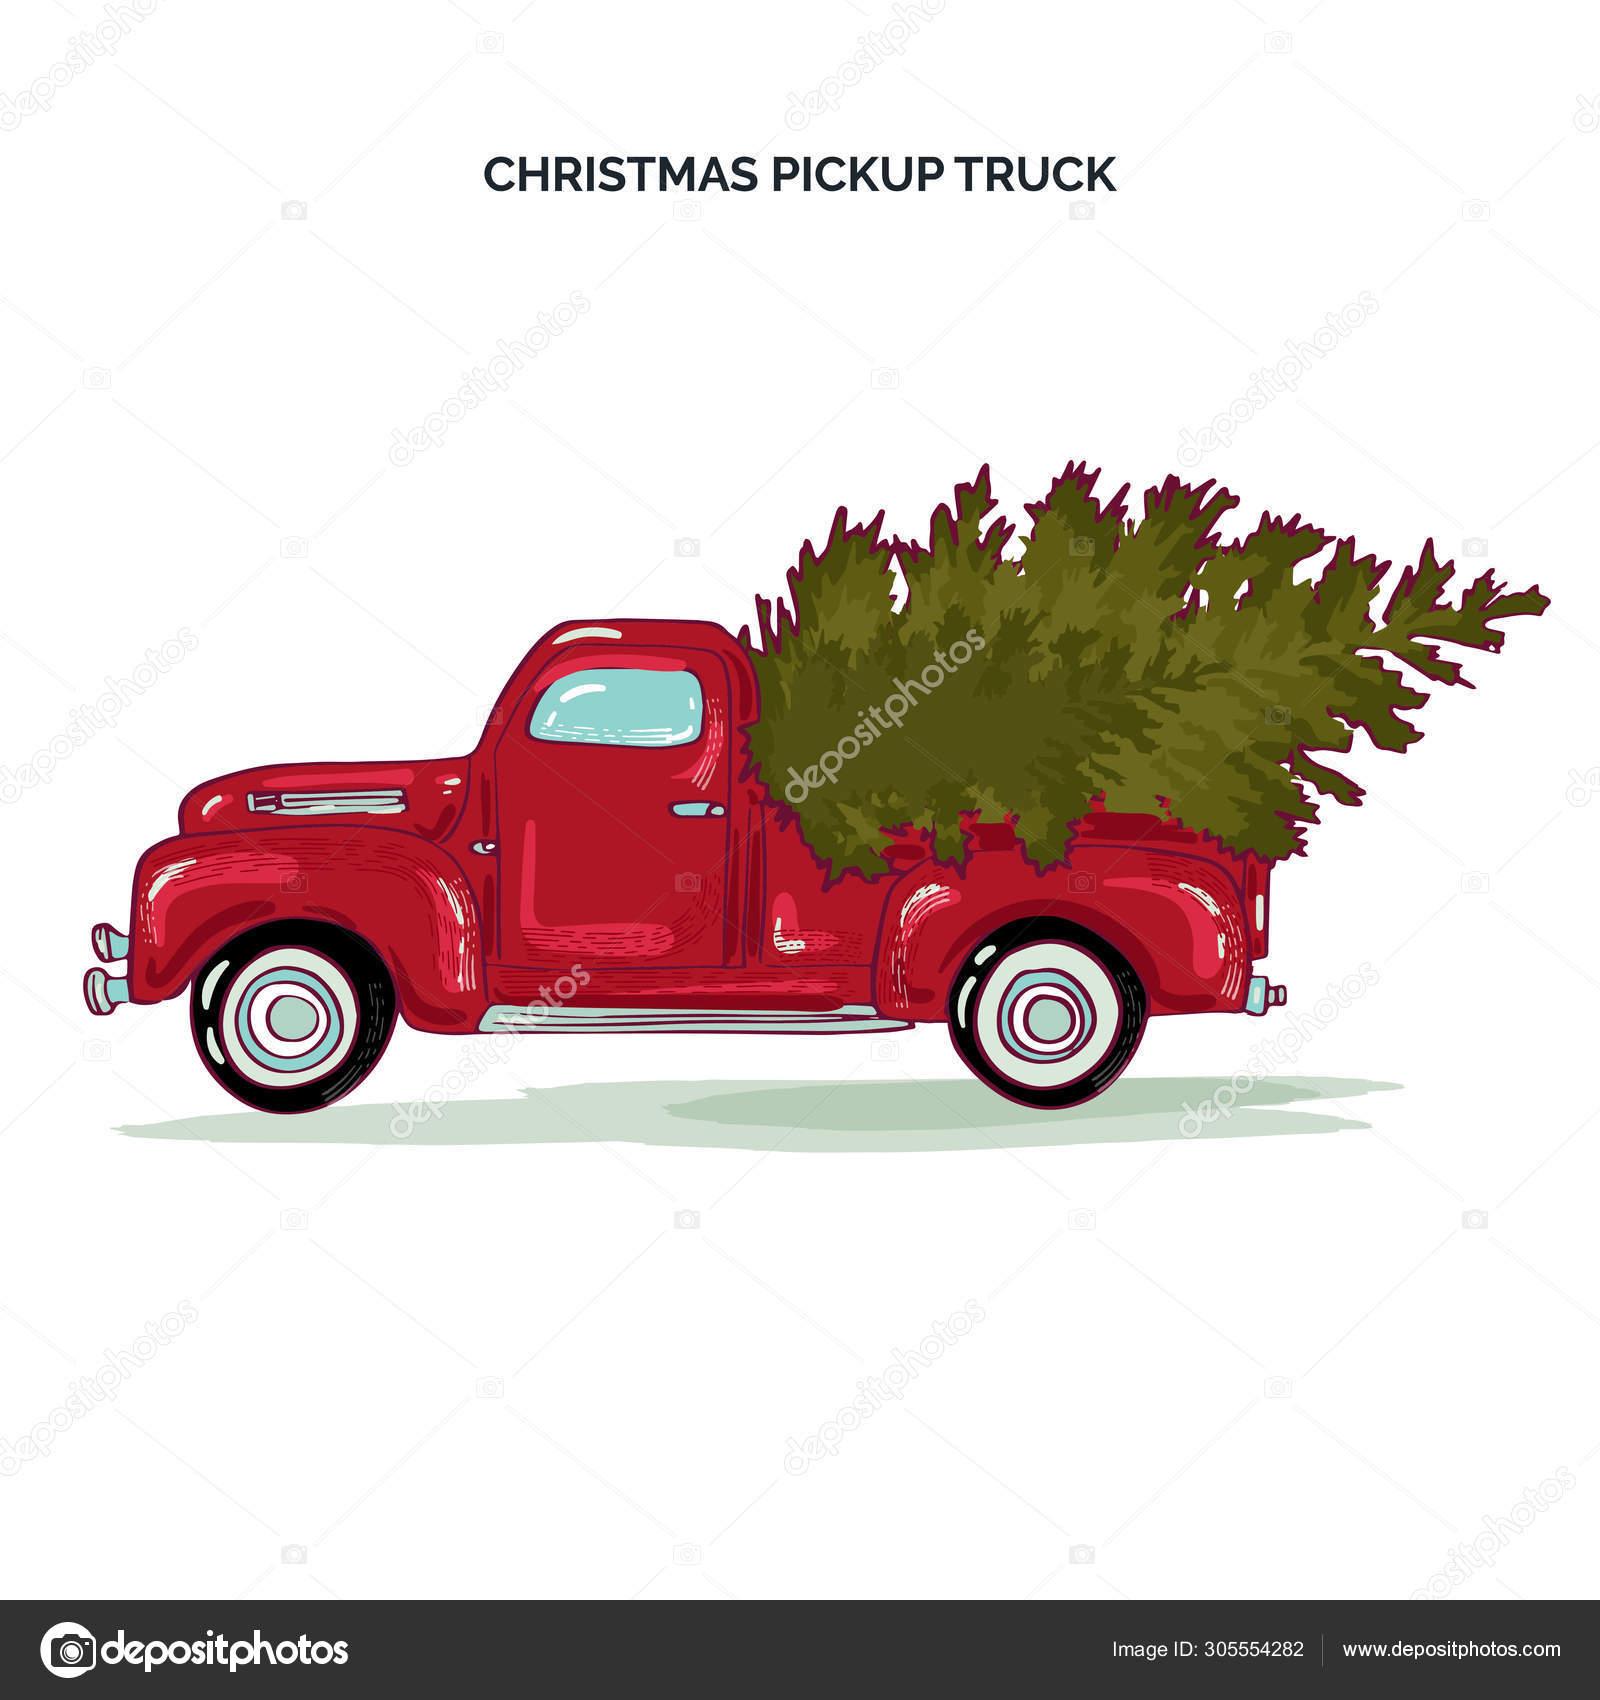 Pickup Truck Christmas Tree Christmas Card Red Retro Truck Fir Stock Vector C Ashraf171 305554282